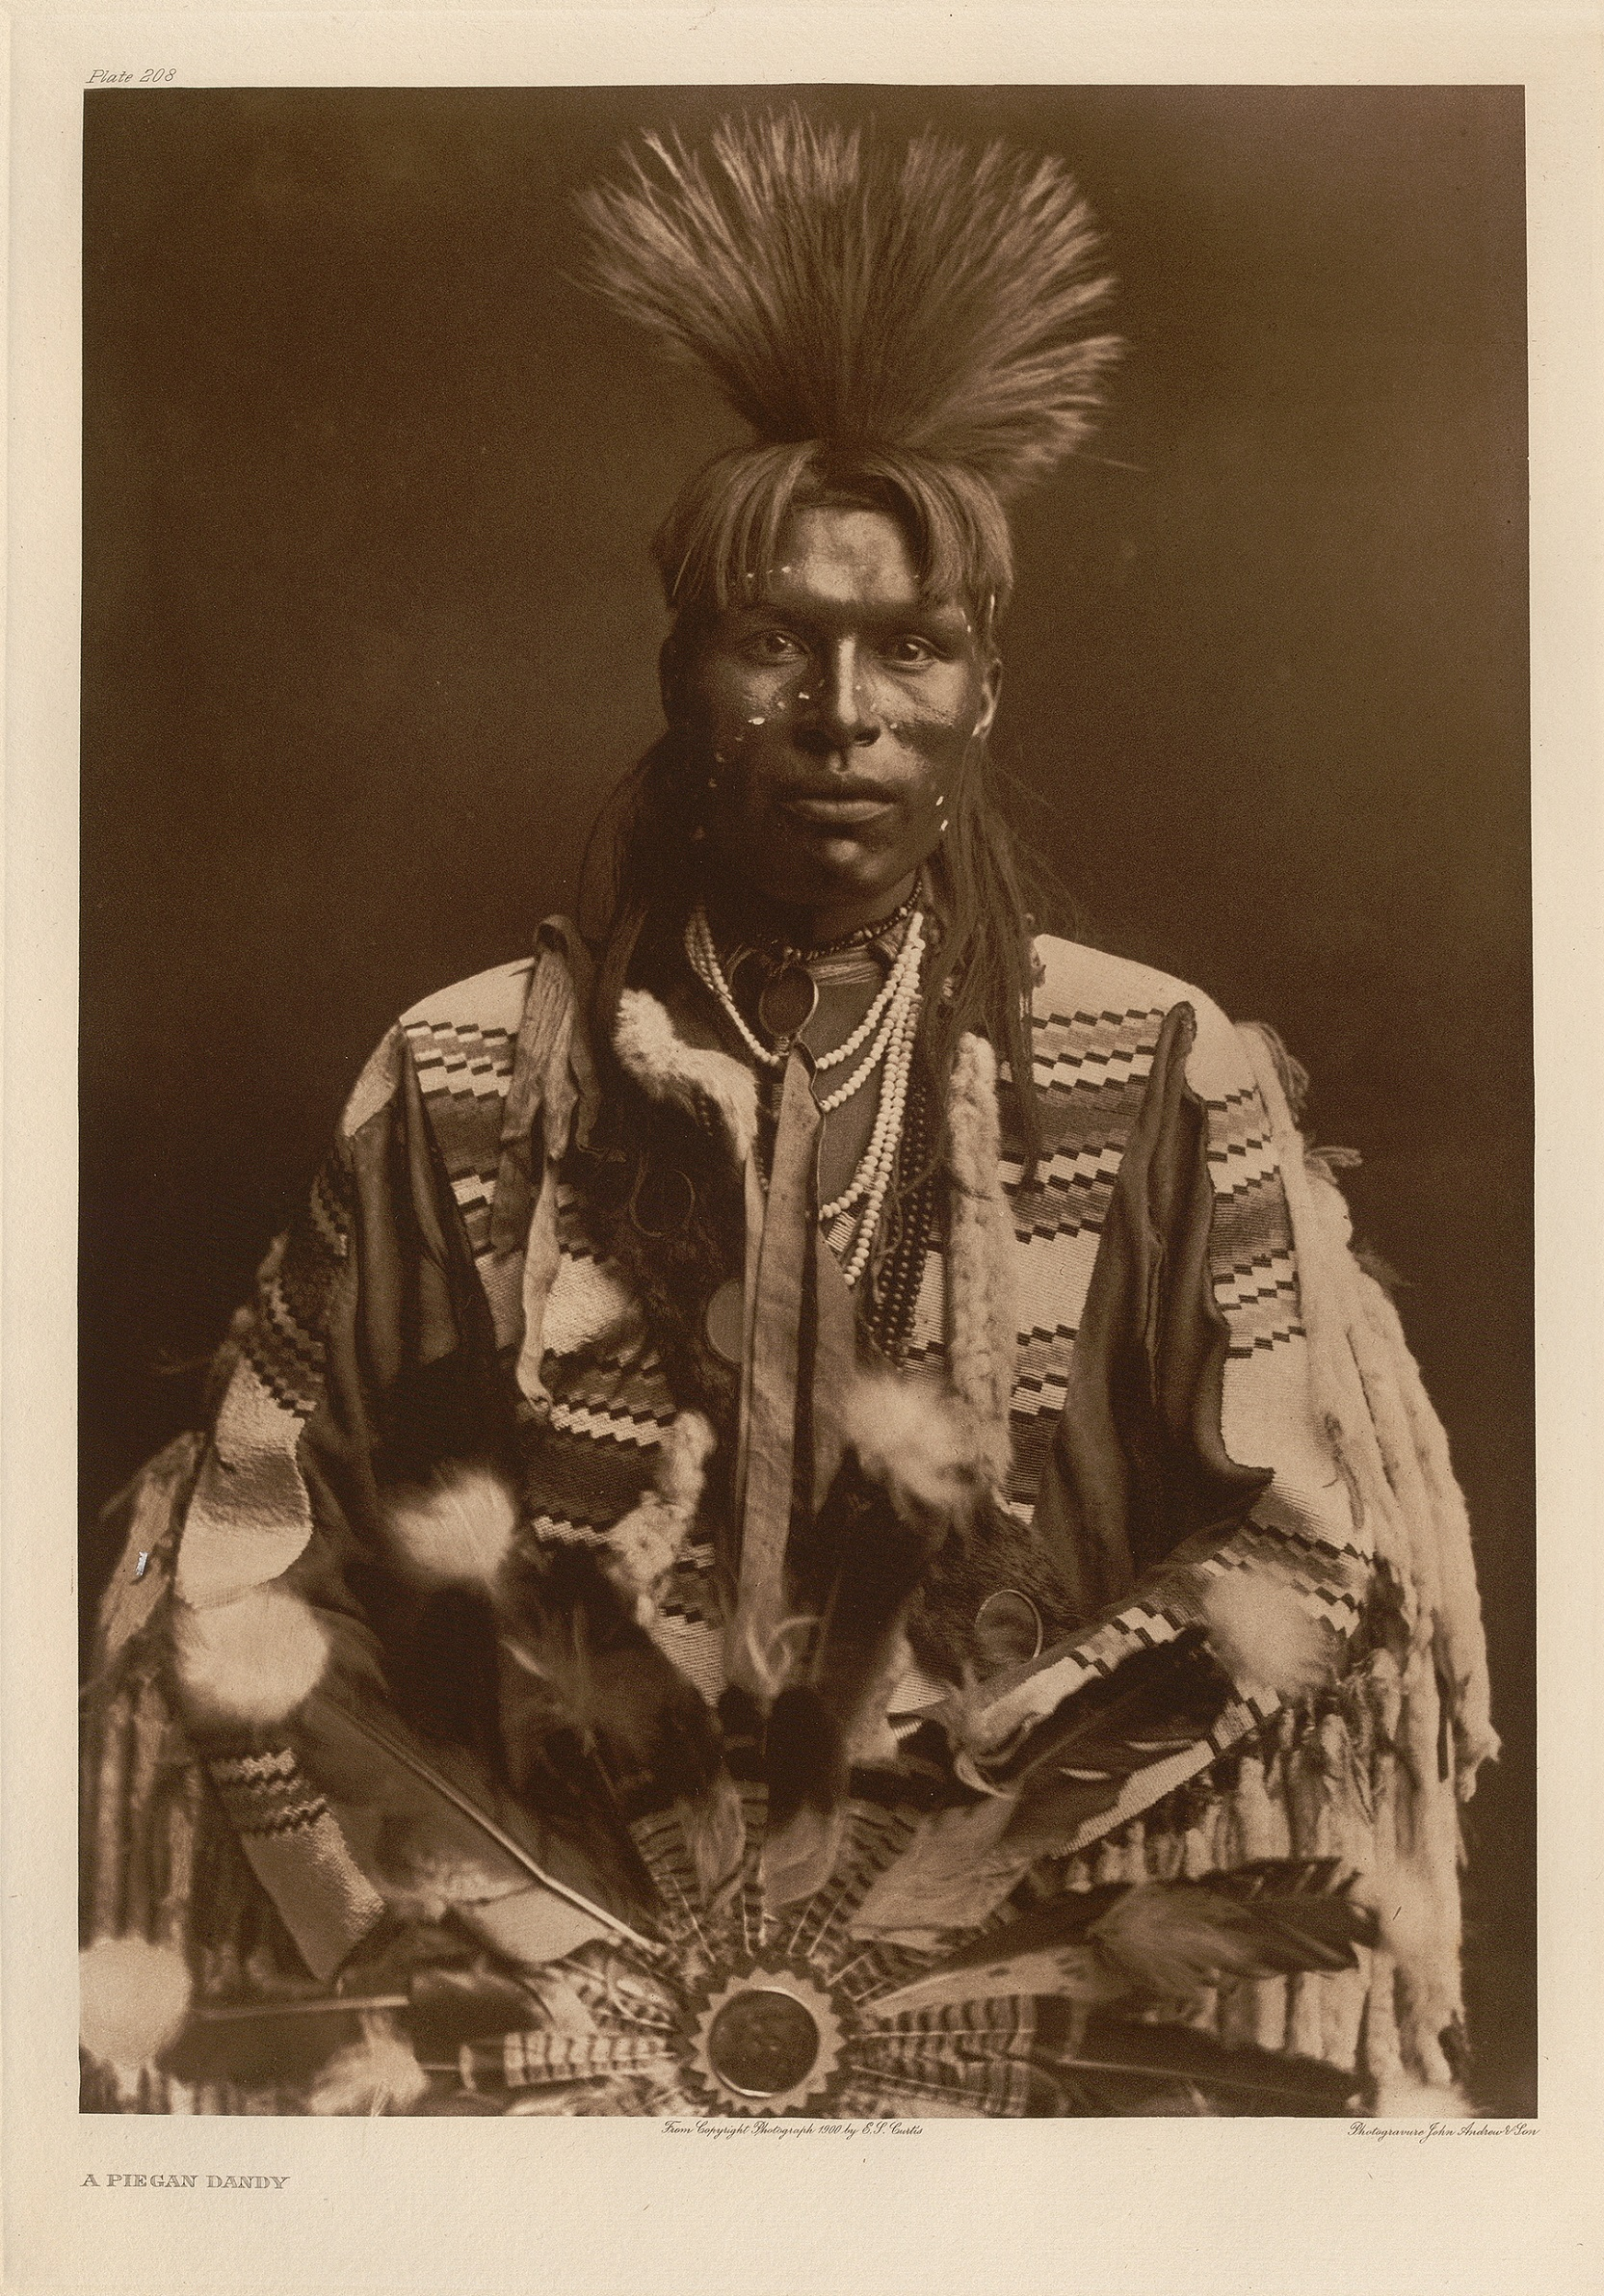 Photogravure of Piegan man in ceremonial dress